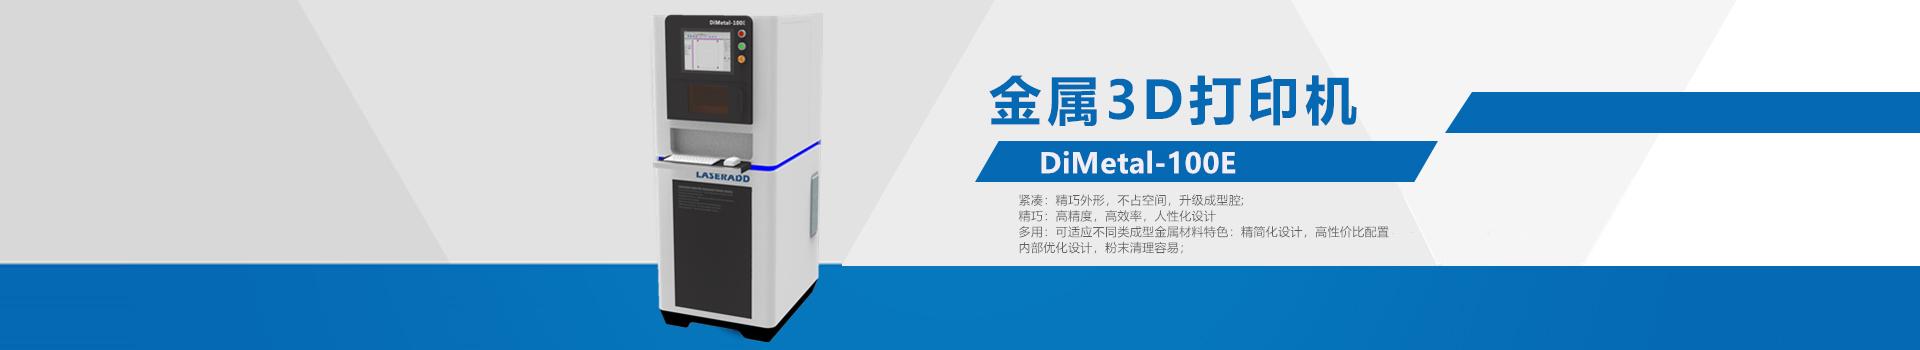 DiMetal-100E 金属3D打印机